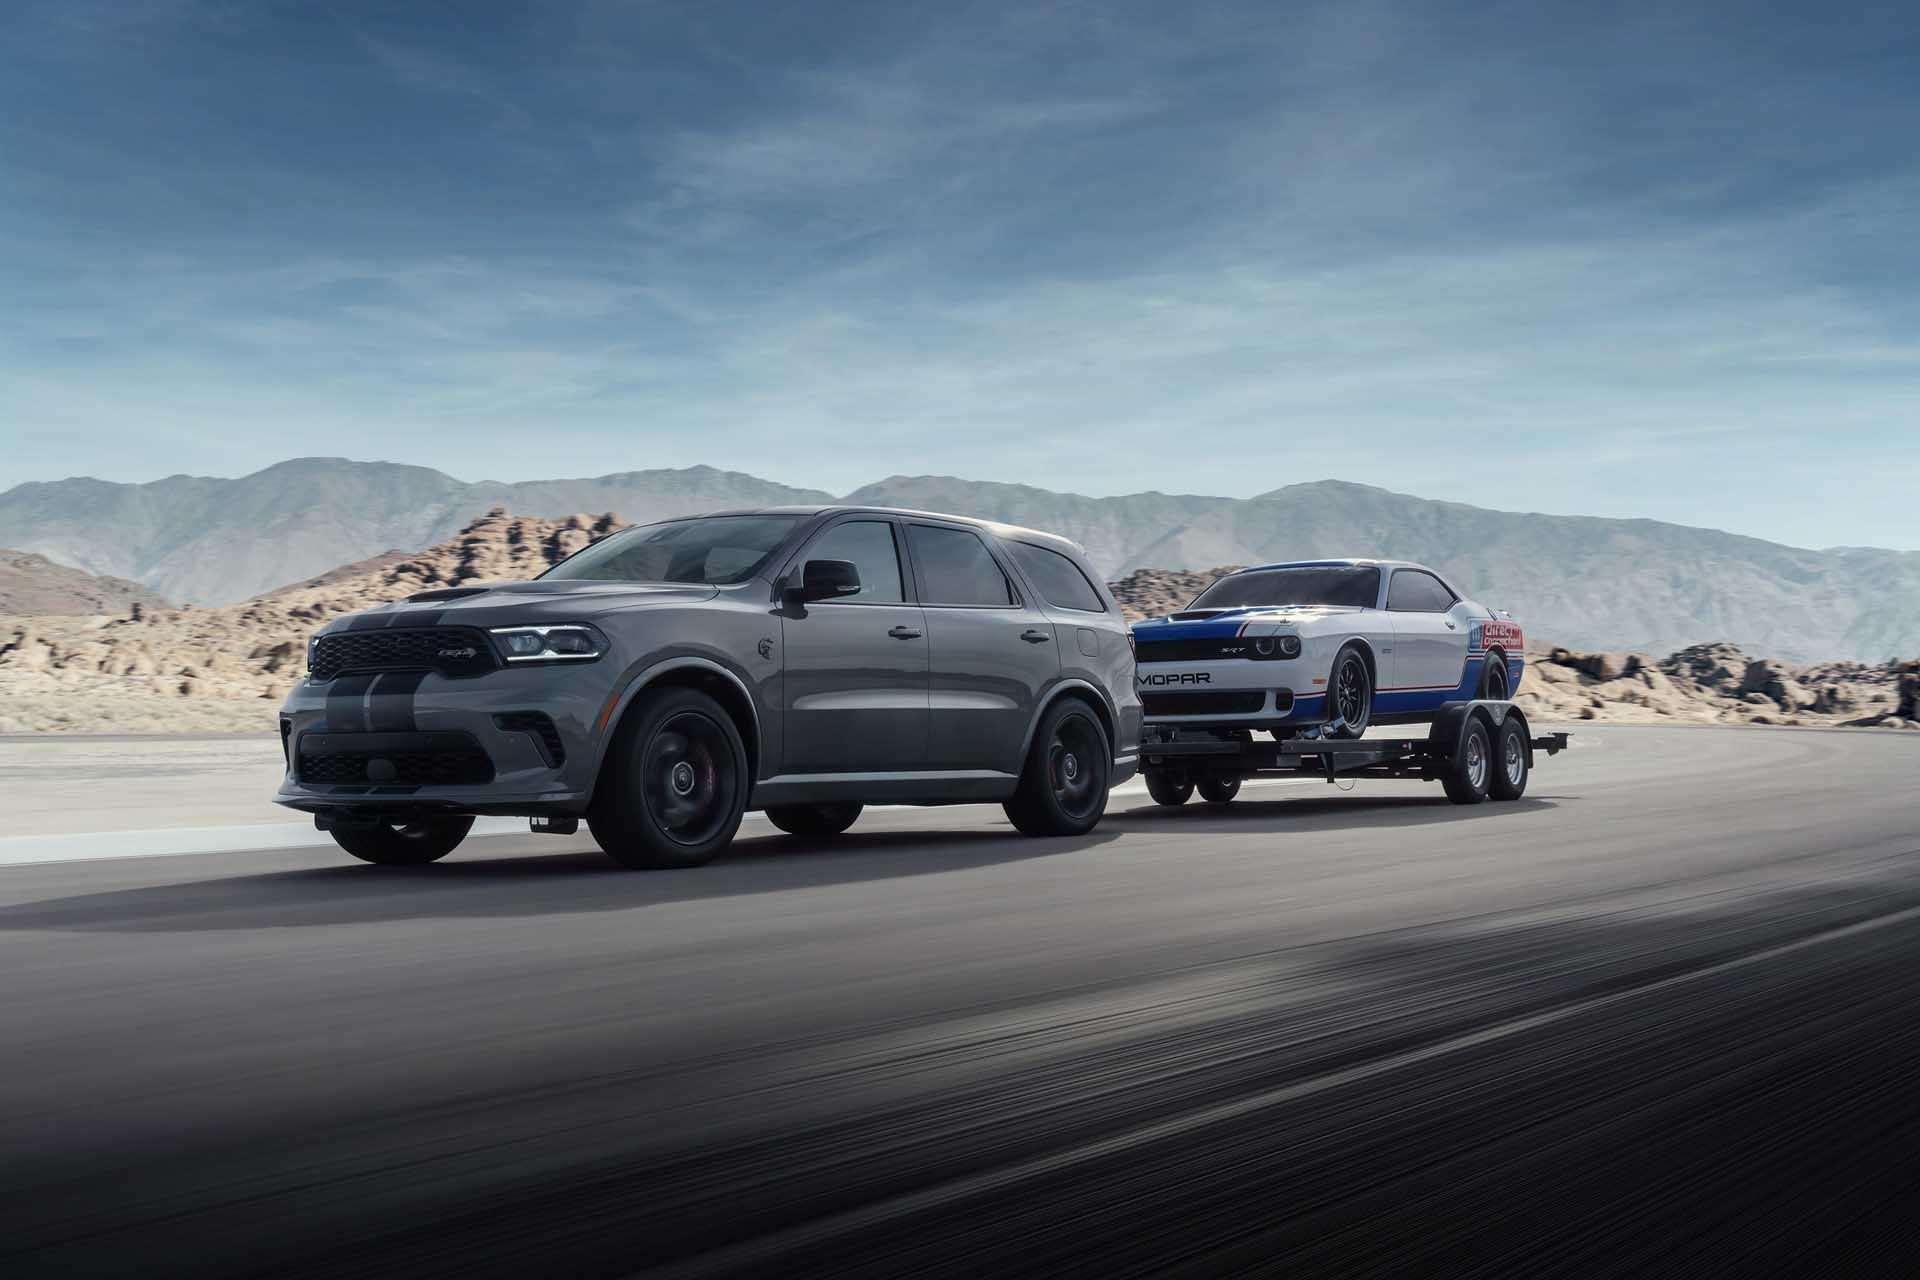 2021 Dodge Durango SRT Hellcat sold out